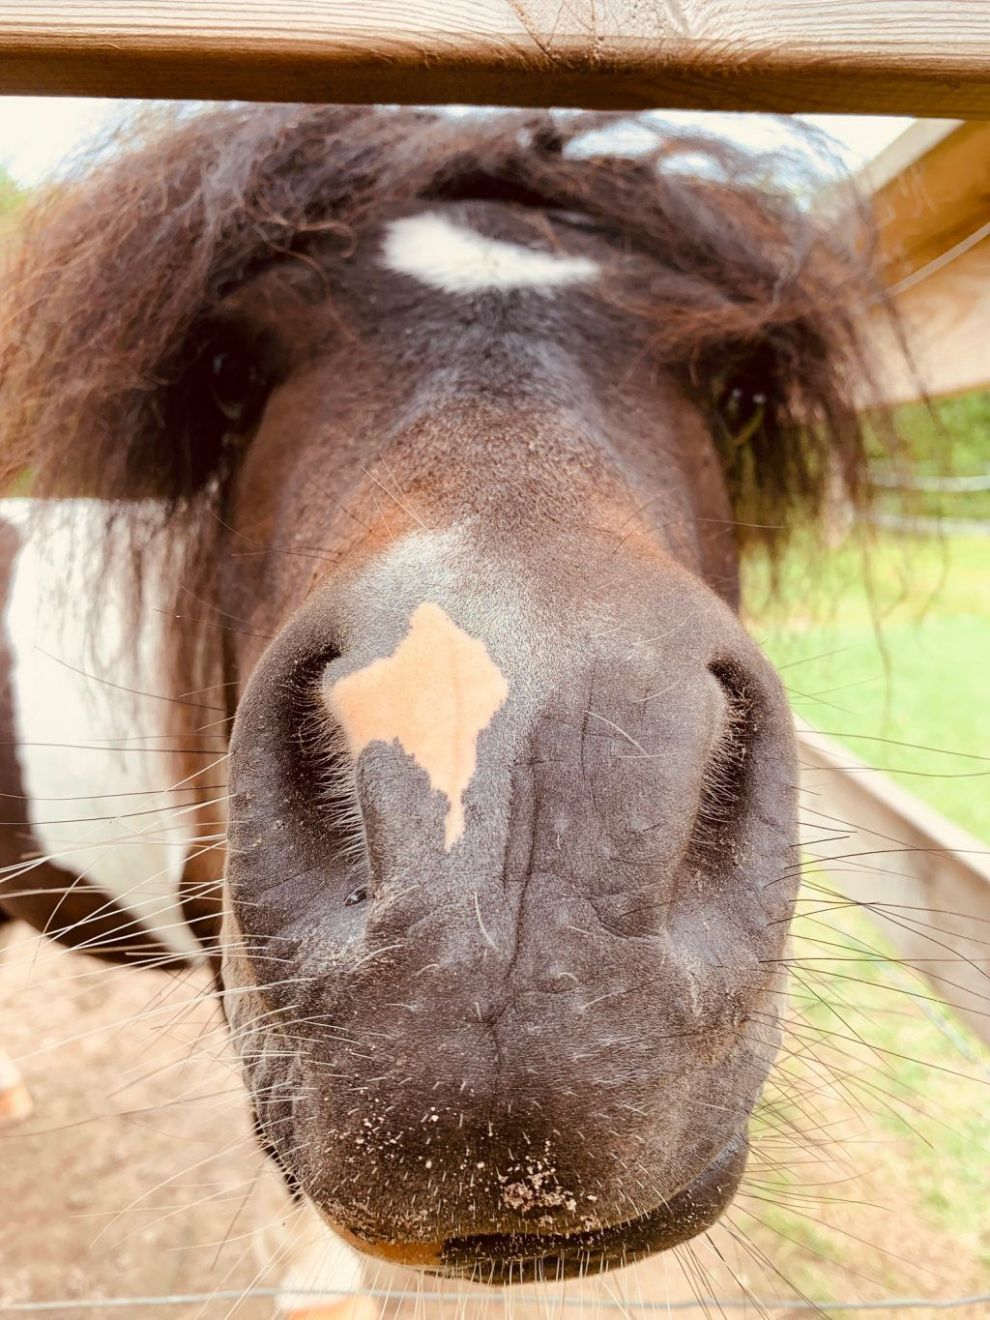 Denmark Hjortdal animal farm horse travels